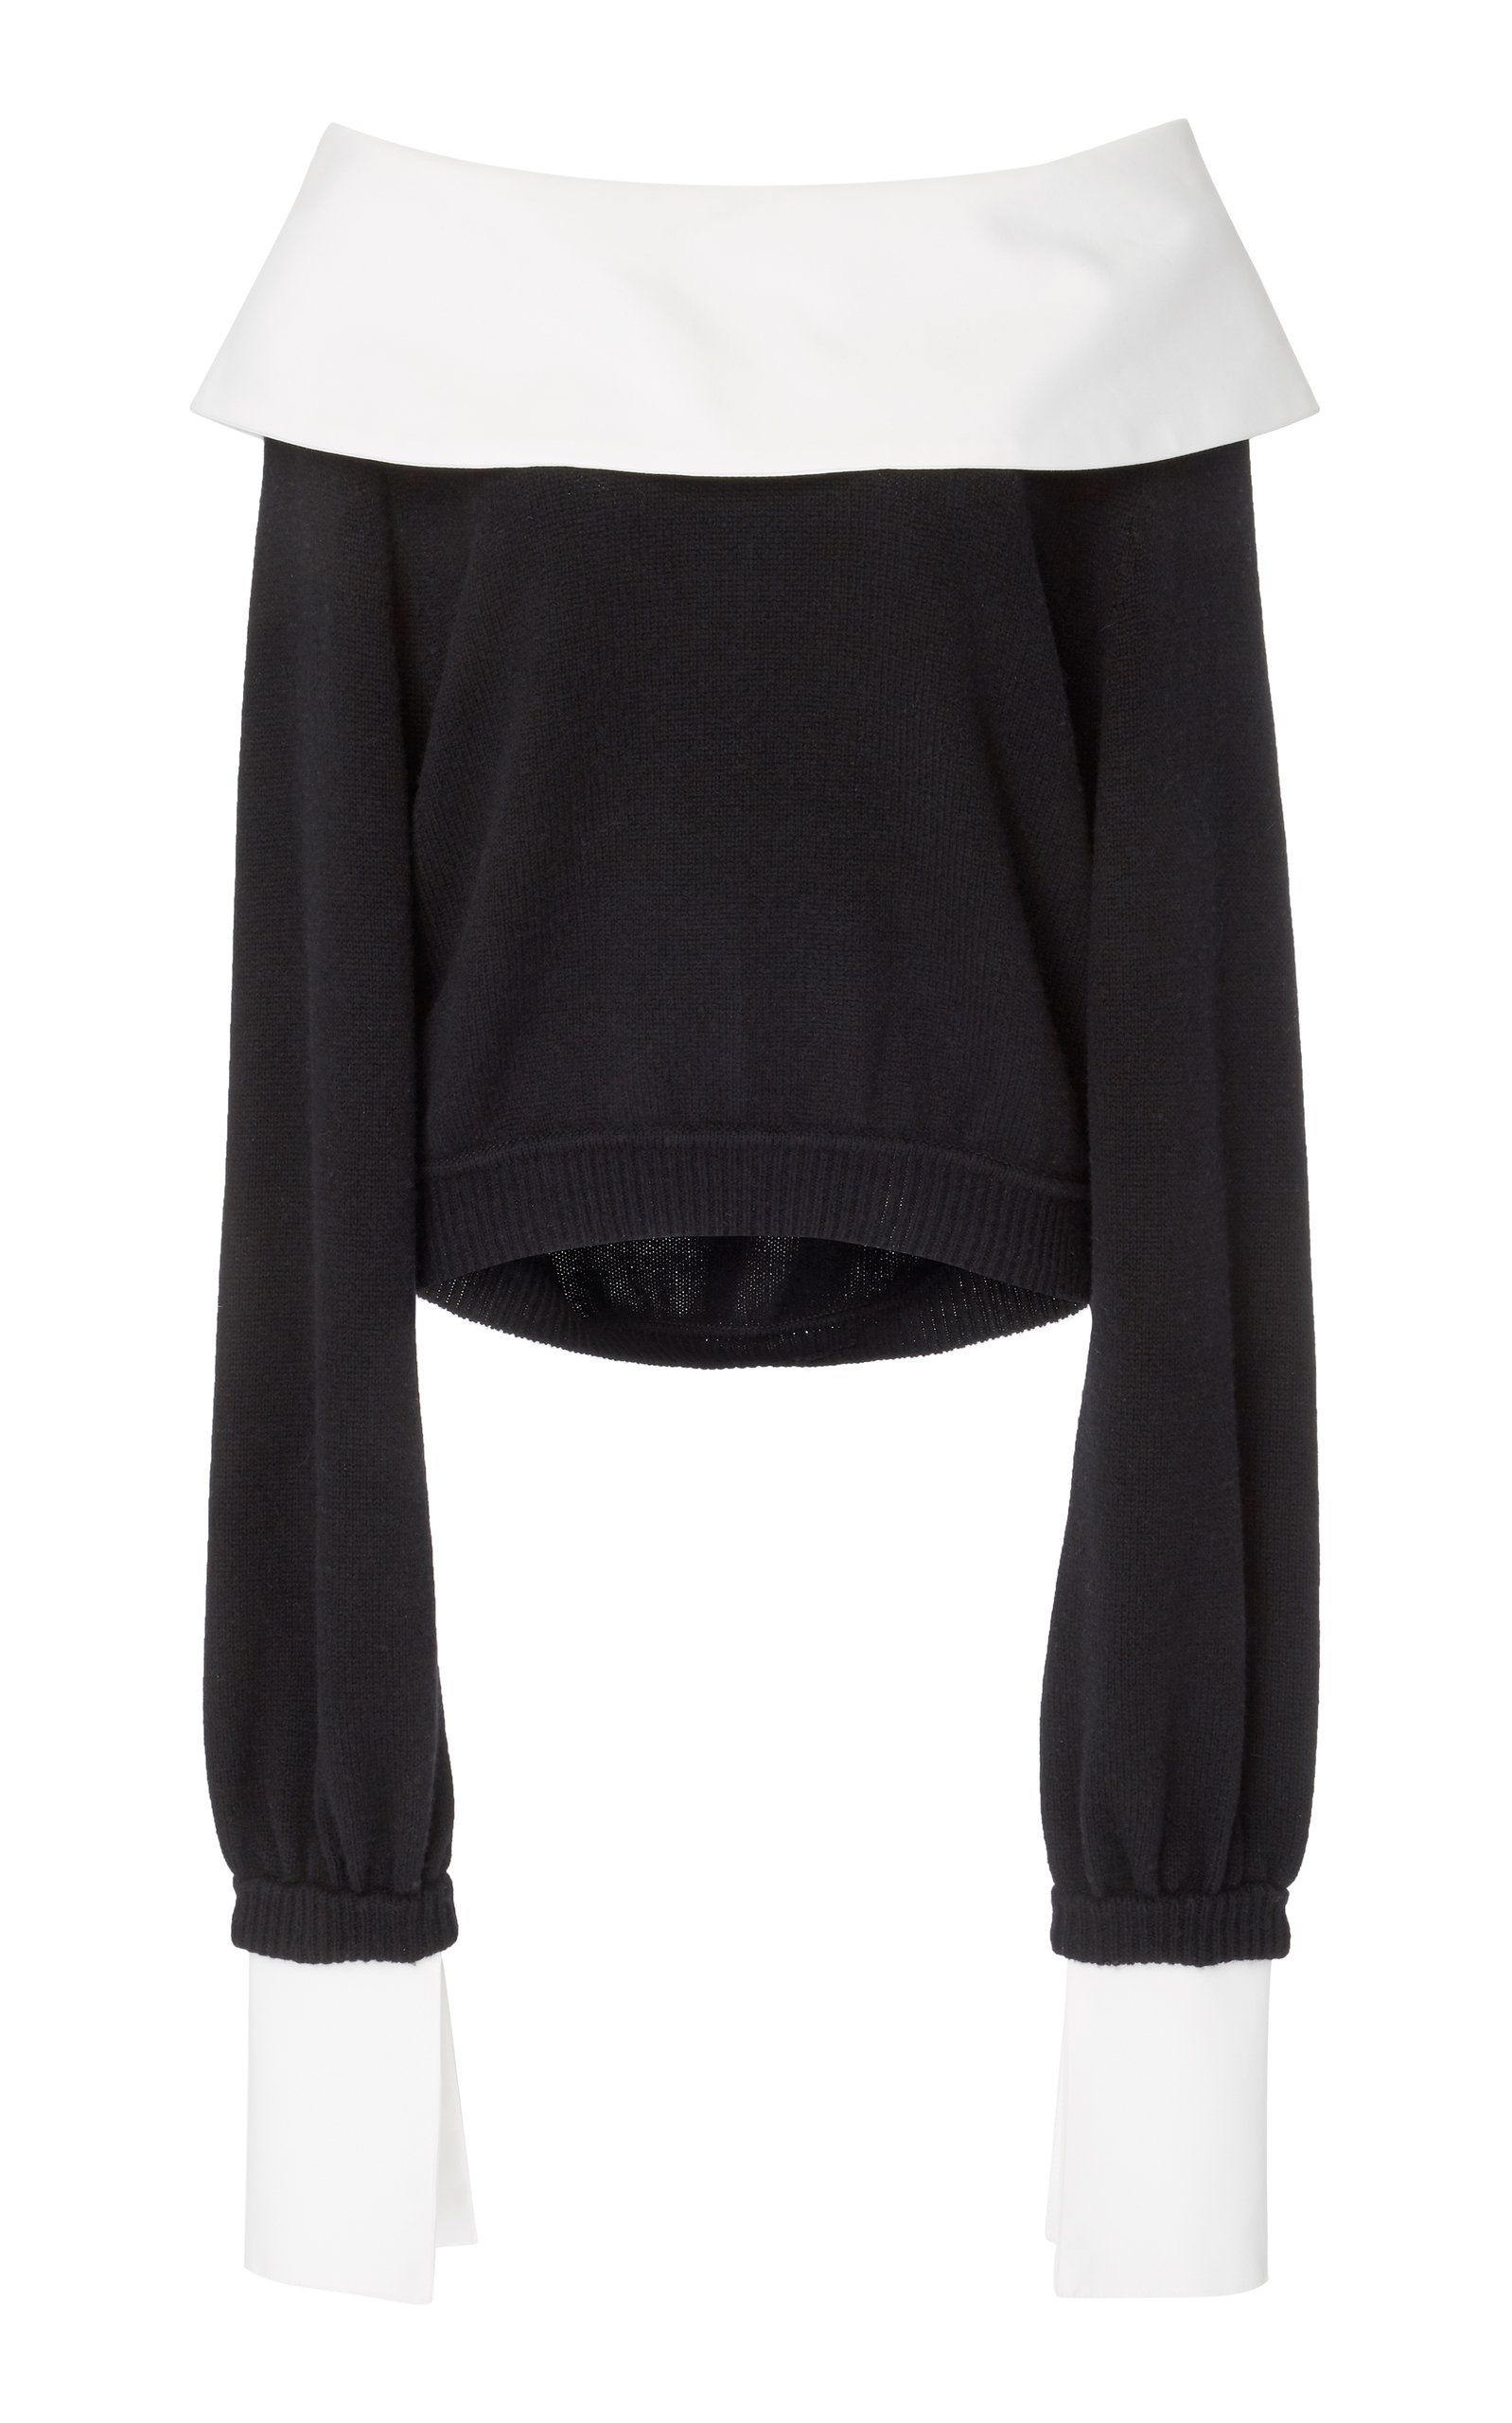 ADEAM Convertible Collared Cashmere Sweatshirt in Black